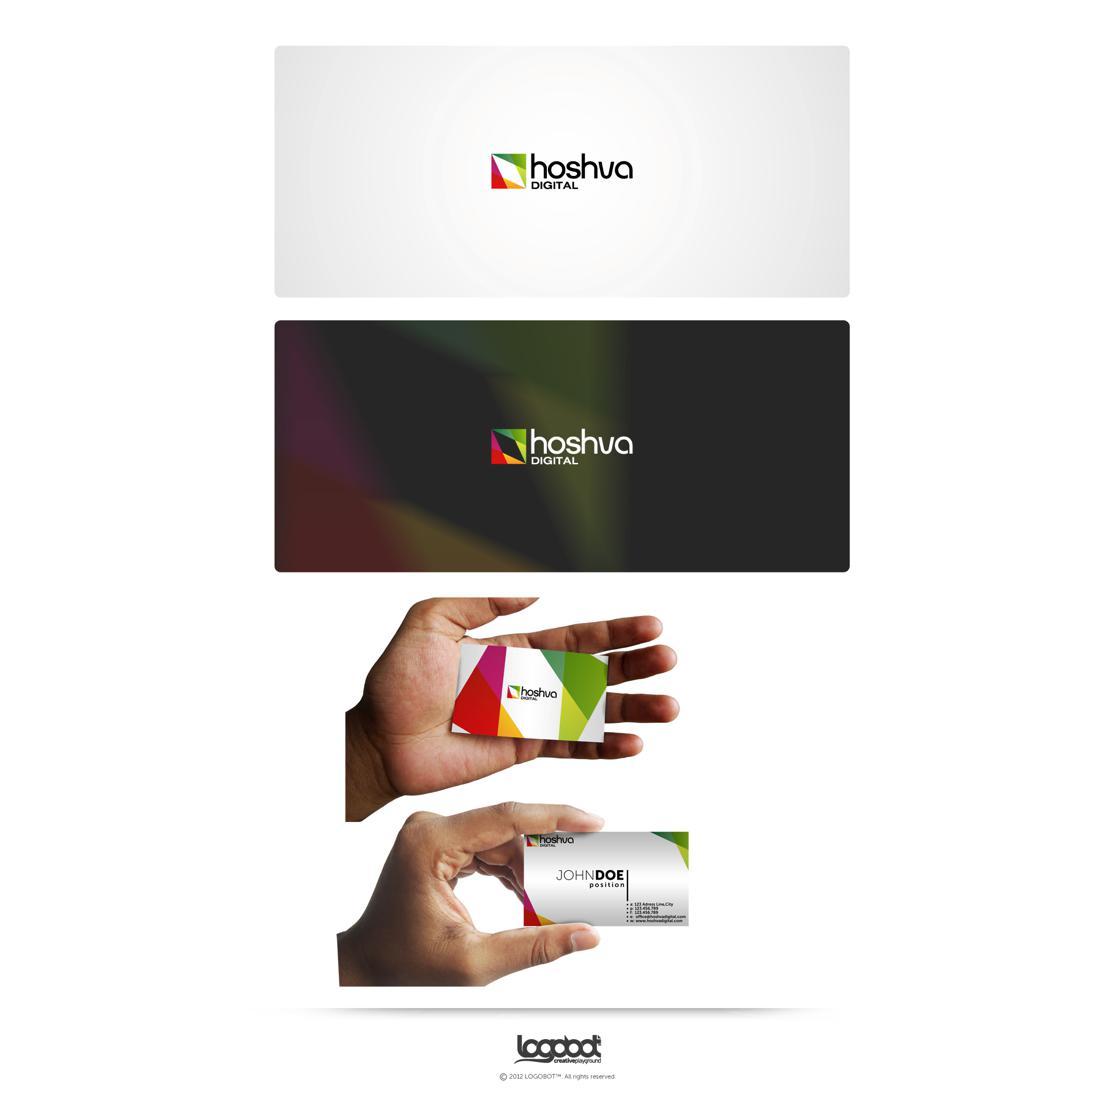 custom business card design by Logobot